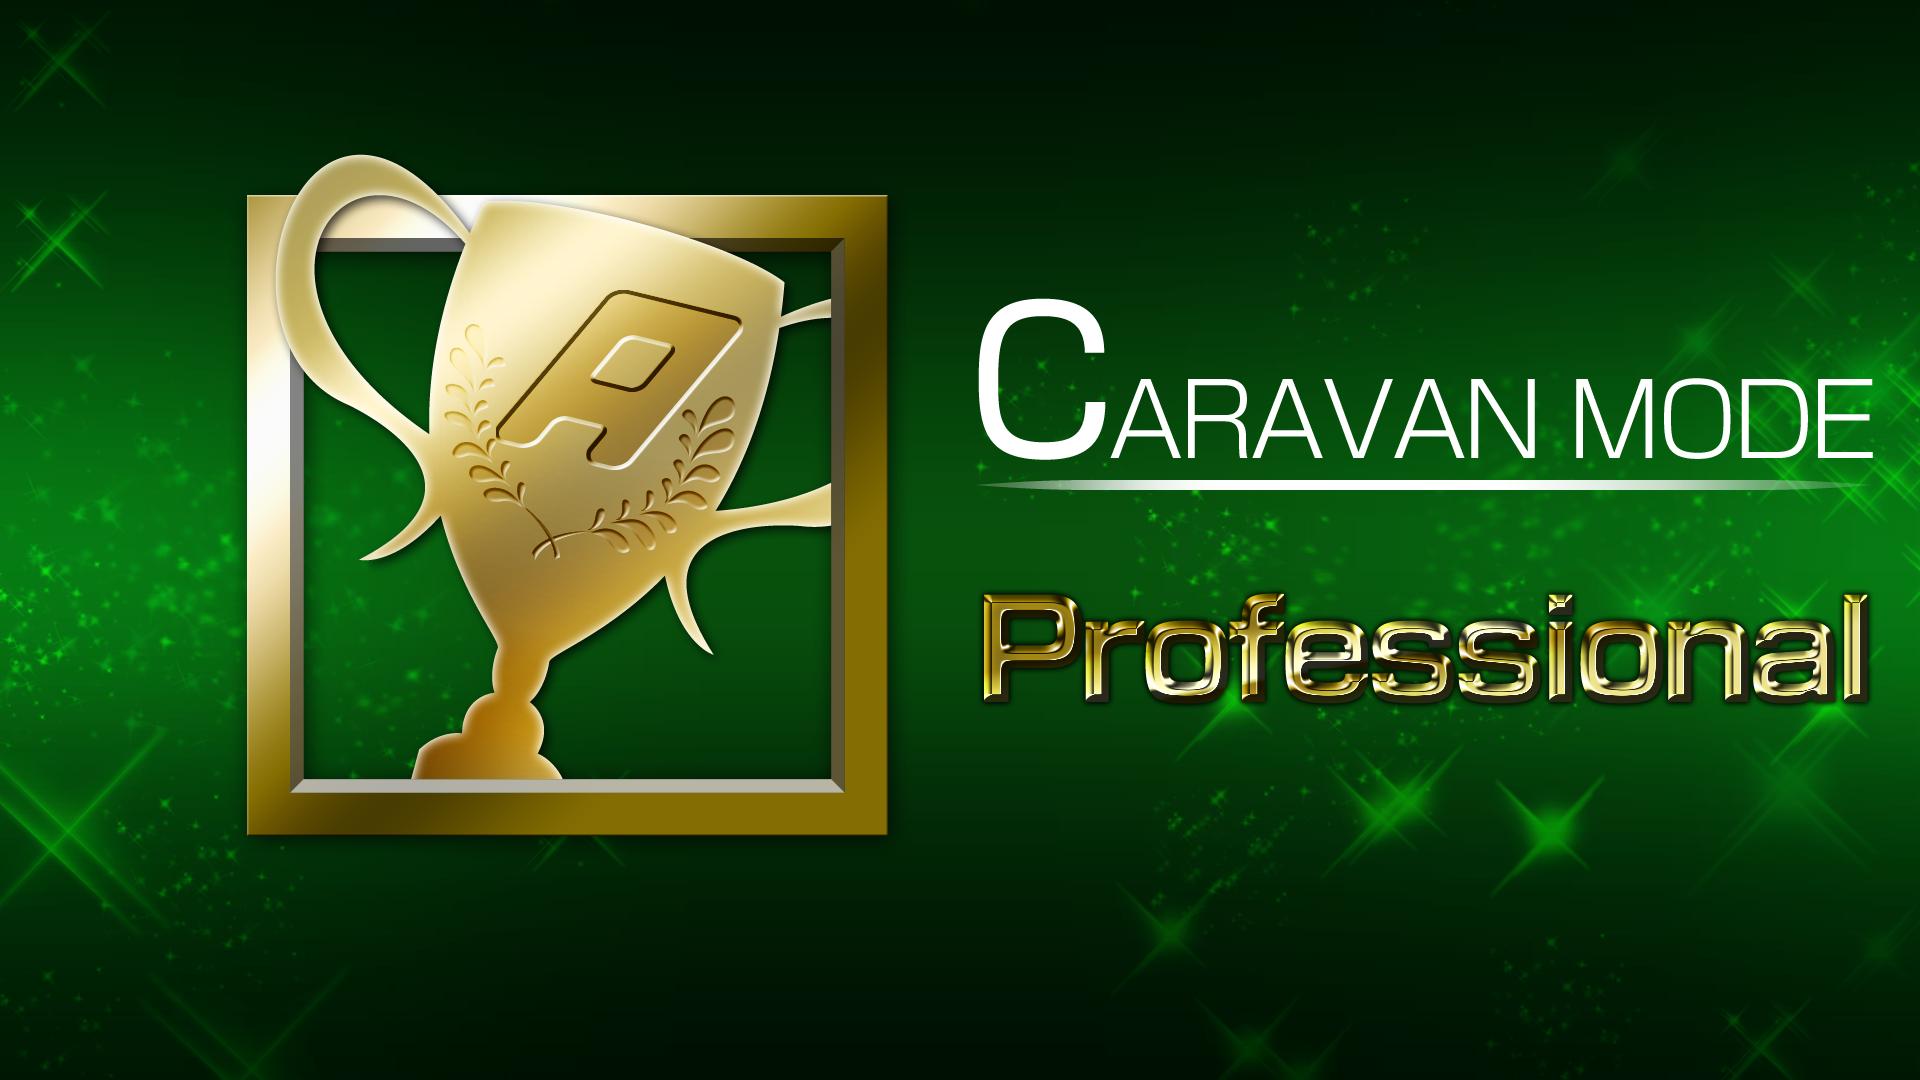 Icon for CARAVAN MODE 30,000 points